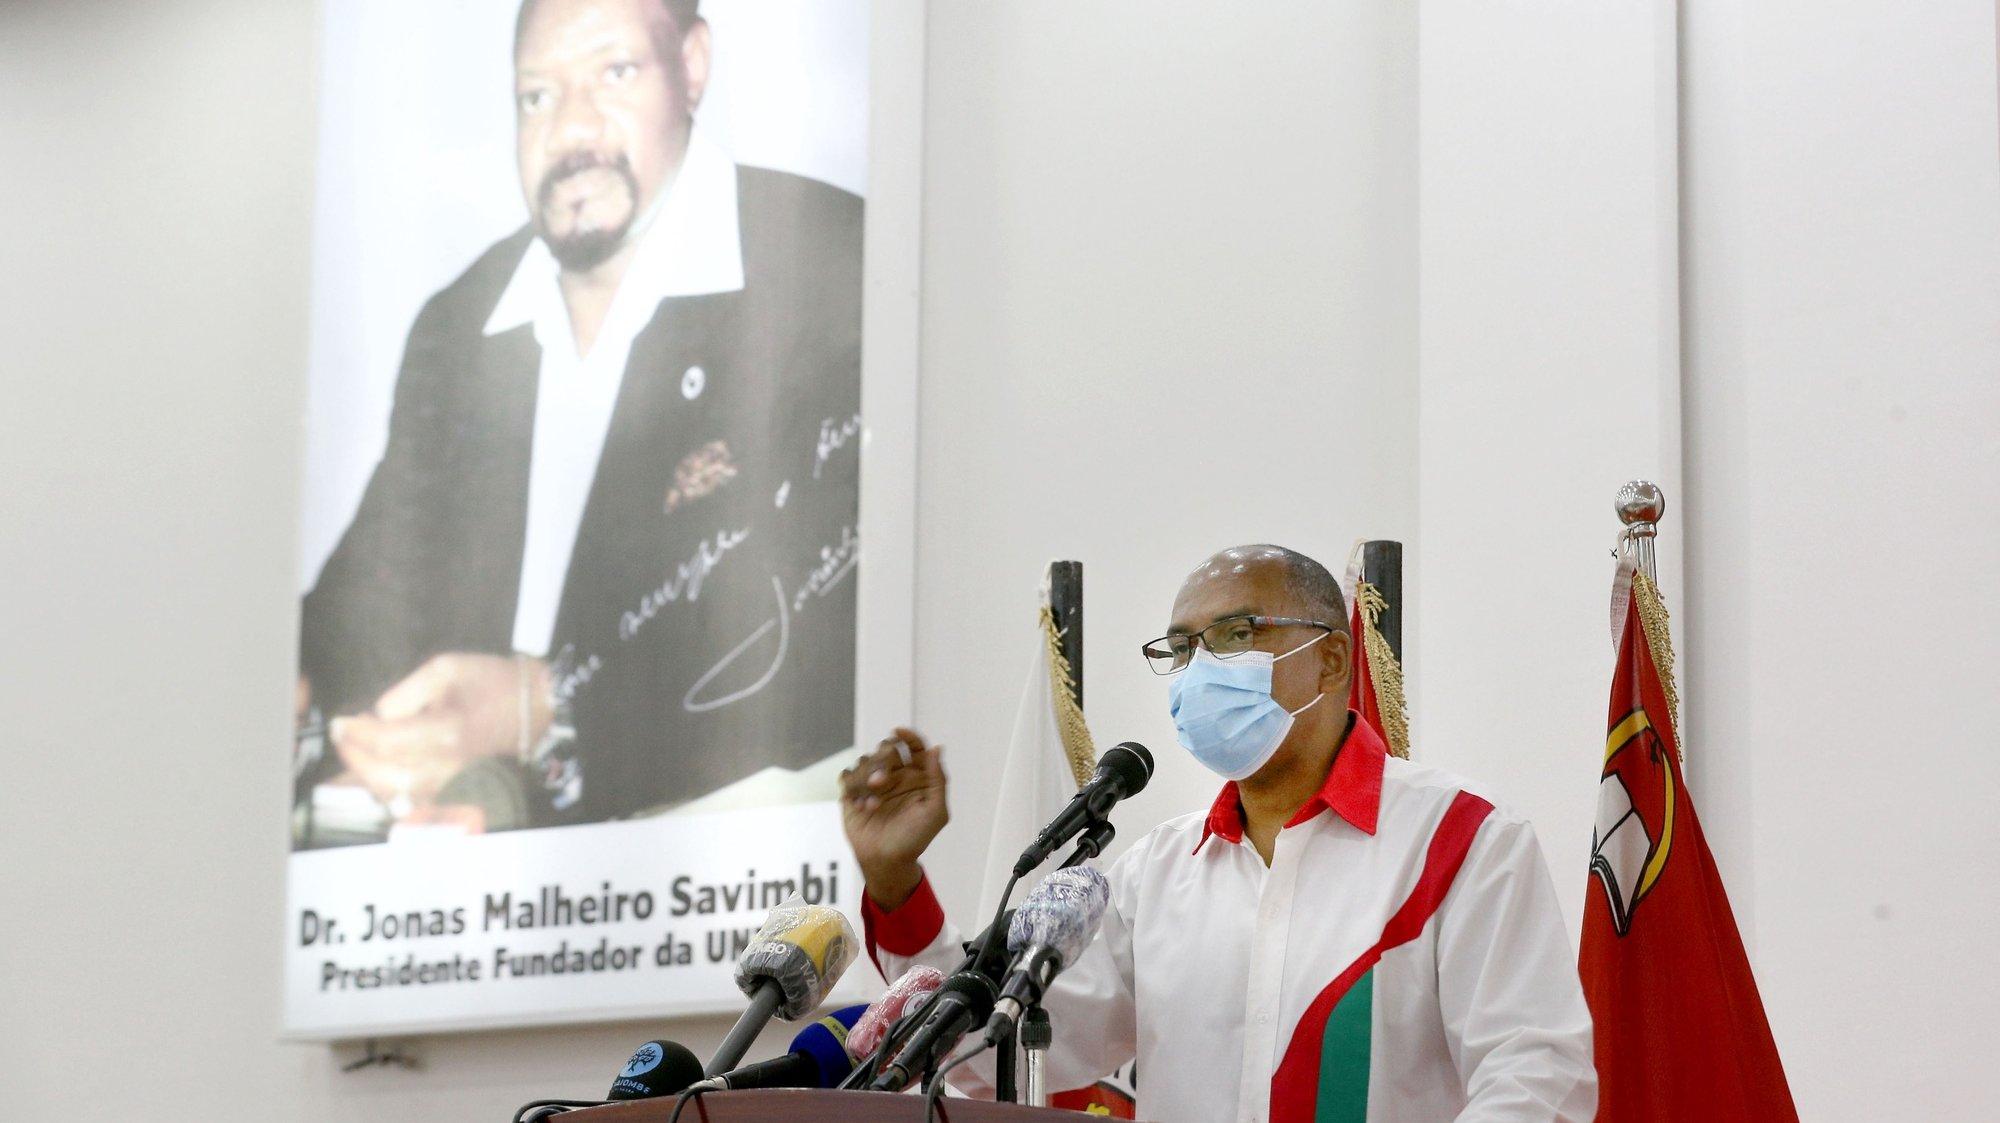 O presidente da UNITA, Adalberto da  Costa Junior, discursa durante a abertura do ano politico do partido, Luanda, Angola, 15 de janeiro de 2021. AMPE ROGÉRIO/LUSA